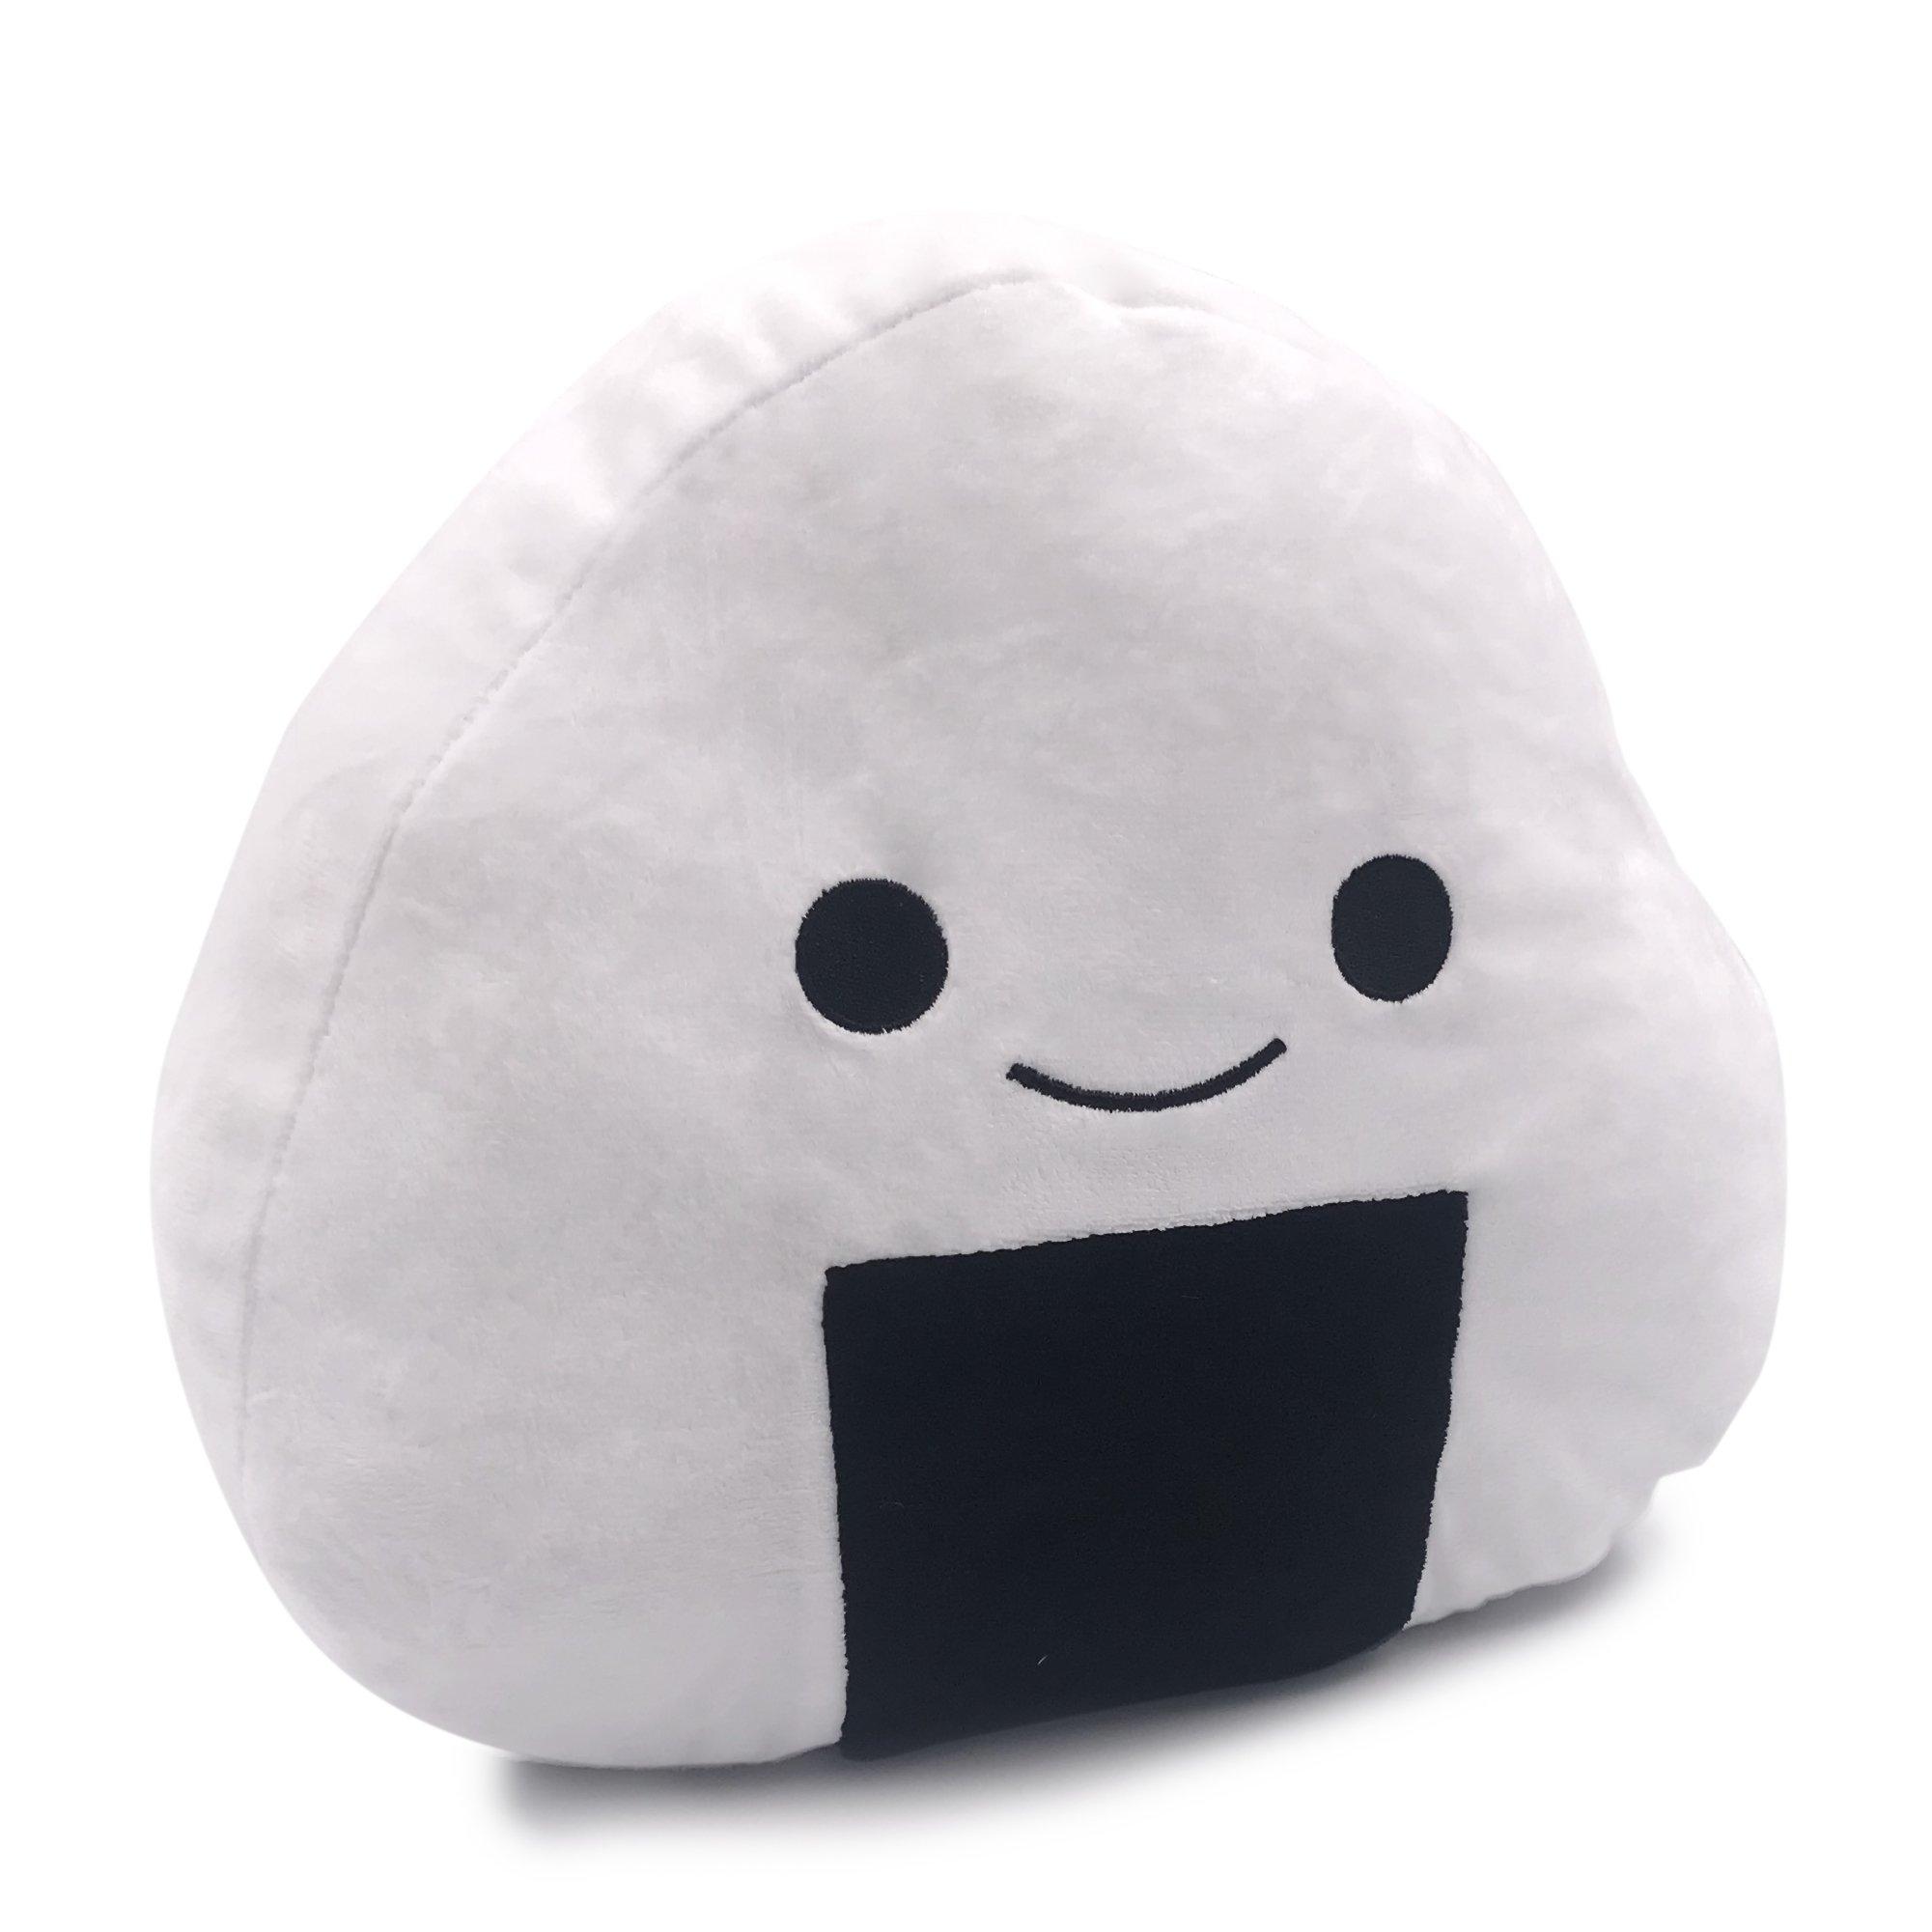 PLUSH TOY WuKong Creative 11.8'' Japanese Rice Sushi Cushion Pillow